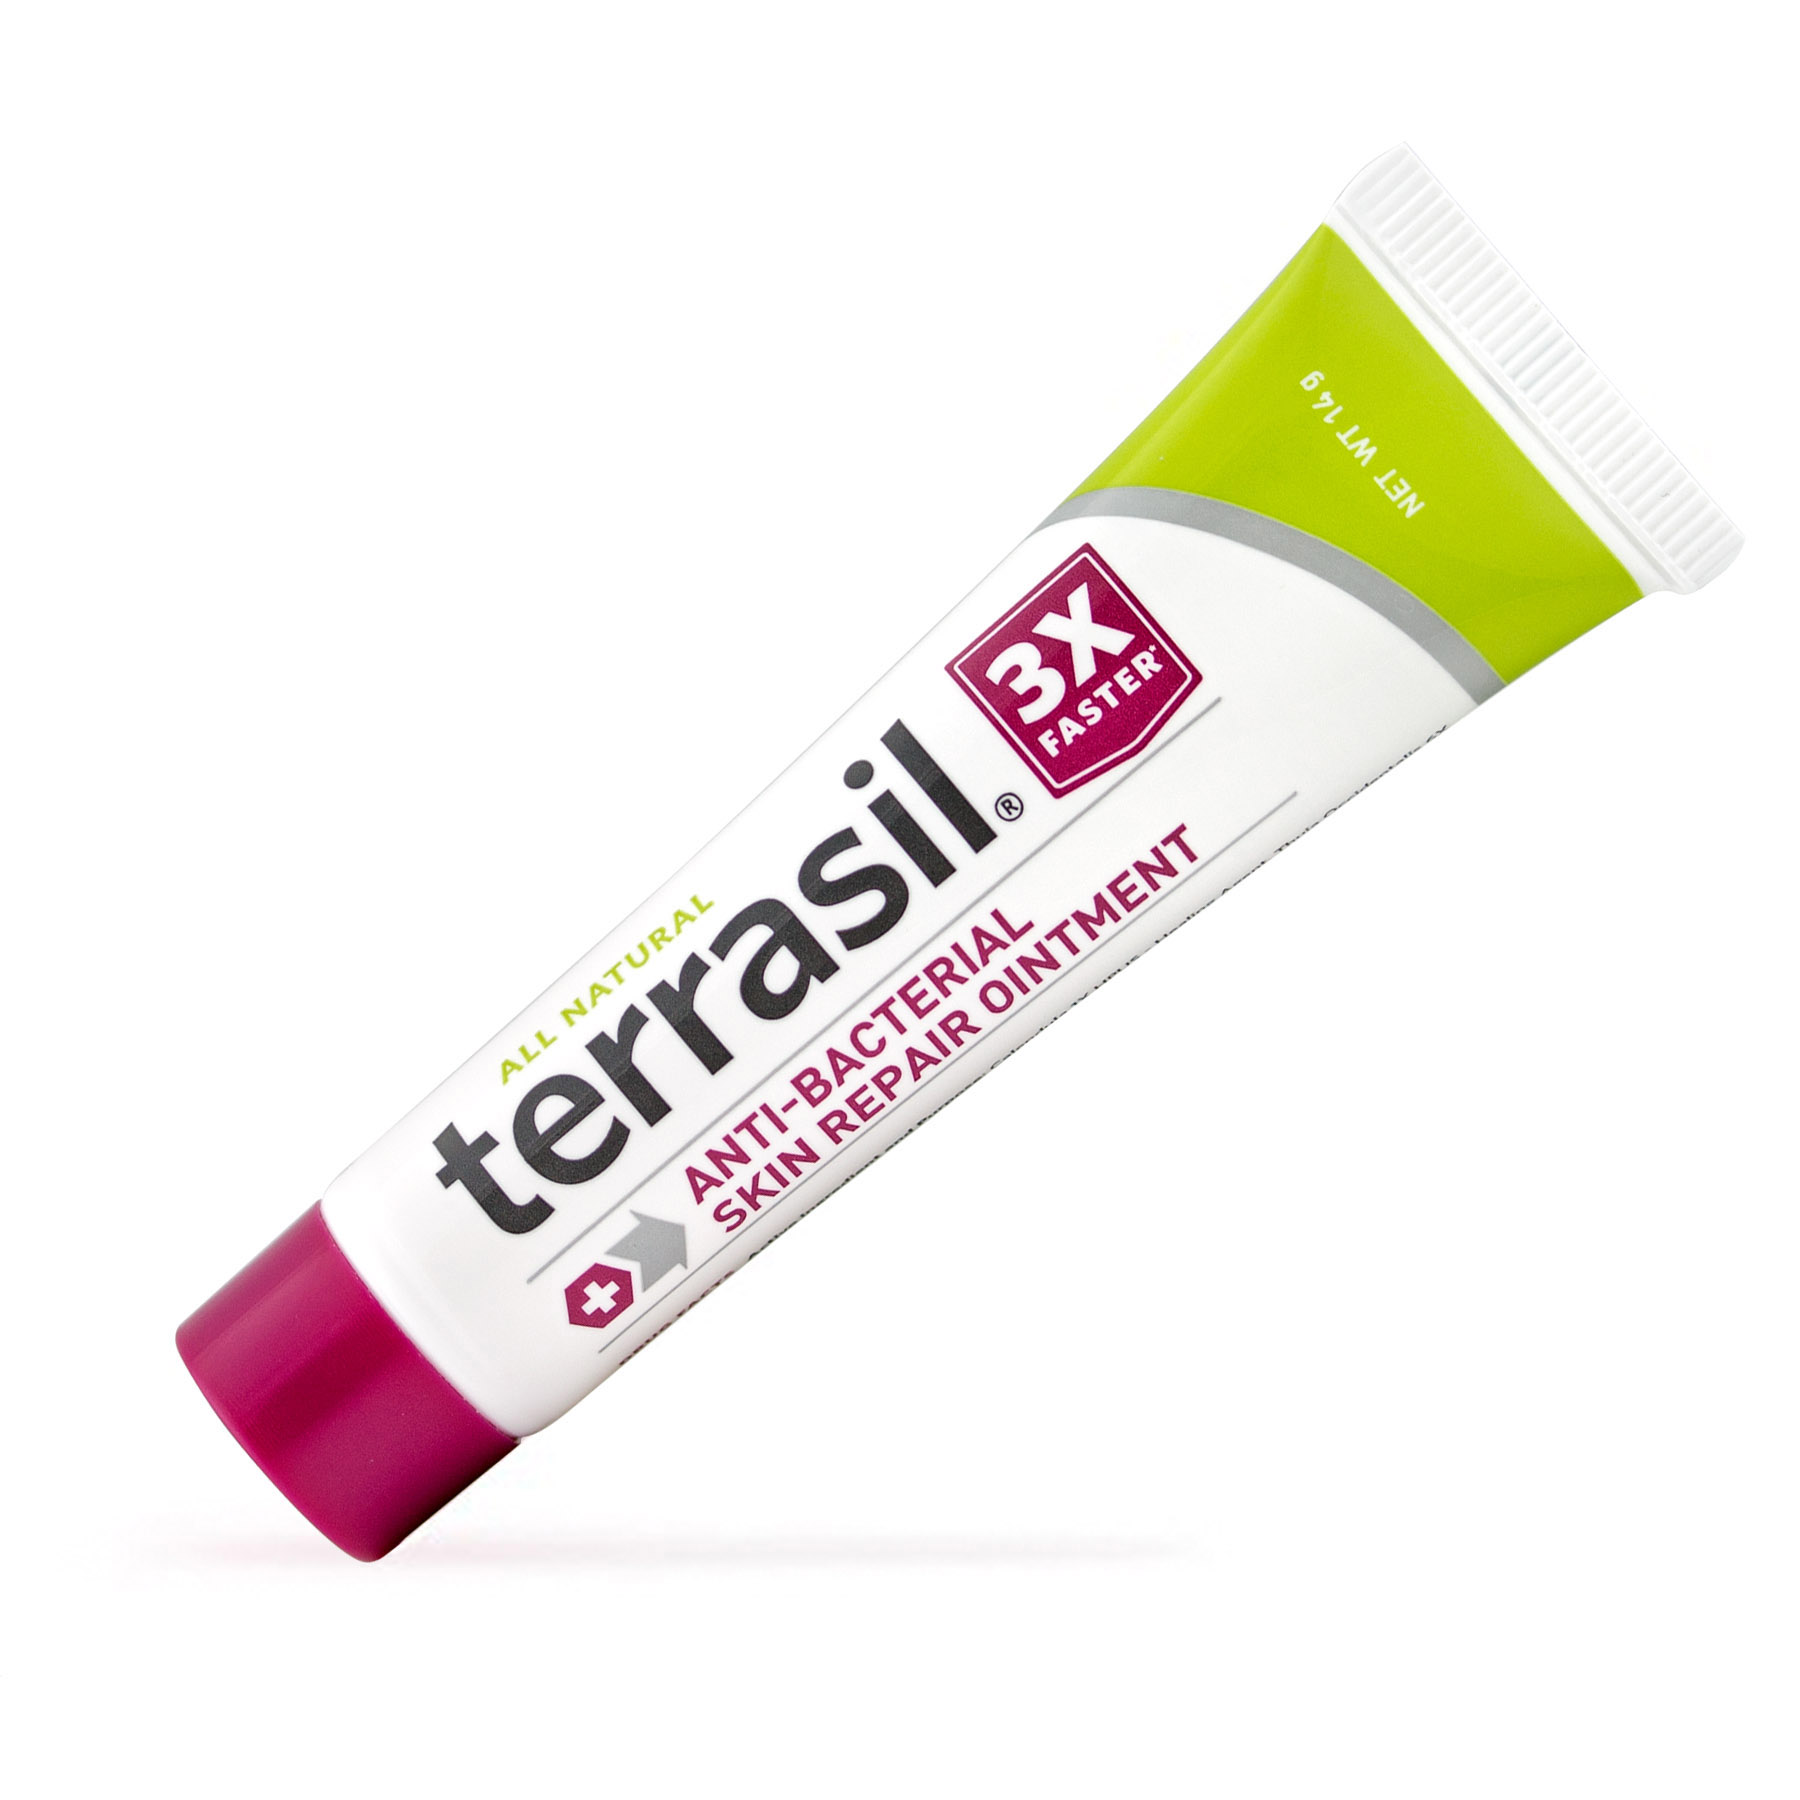 Antibacterial Skin Repair Ointment with All-Natural ...